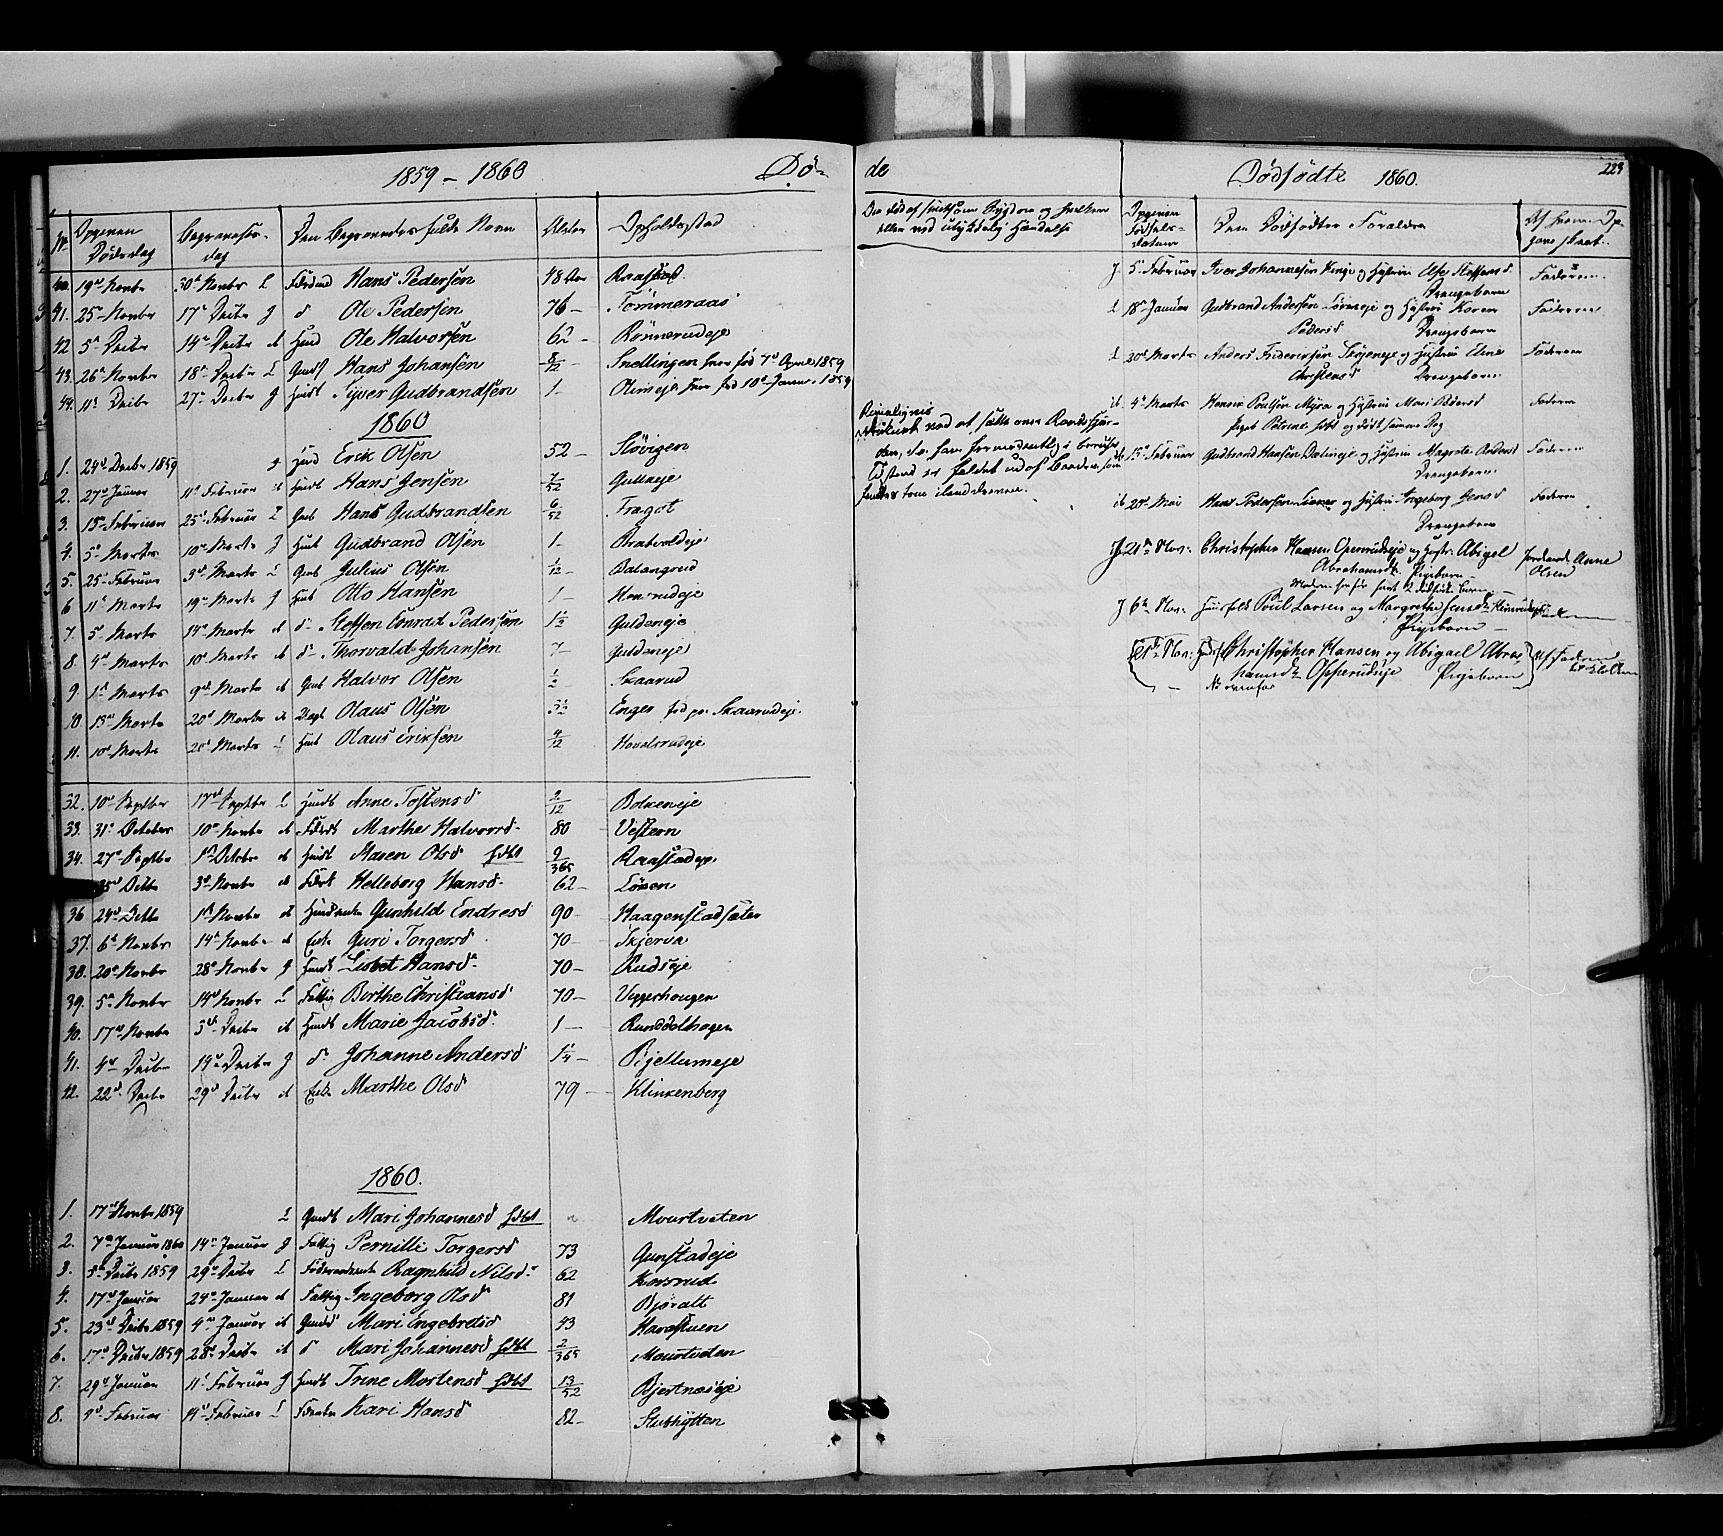 SAH, Jevnaker prestekontor, Ministerialbok nr. 7, 1858-1876, s. 223